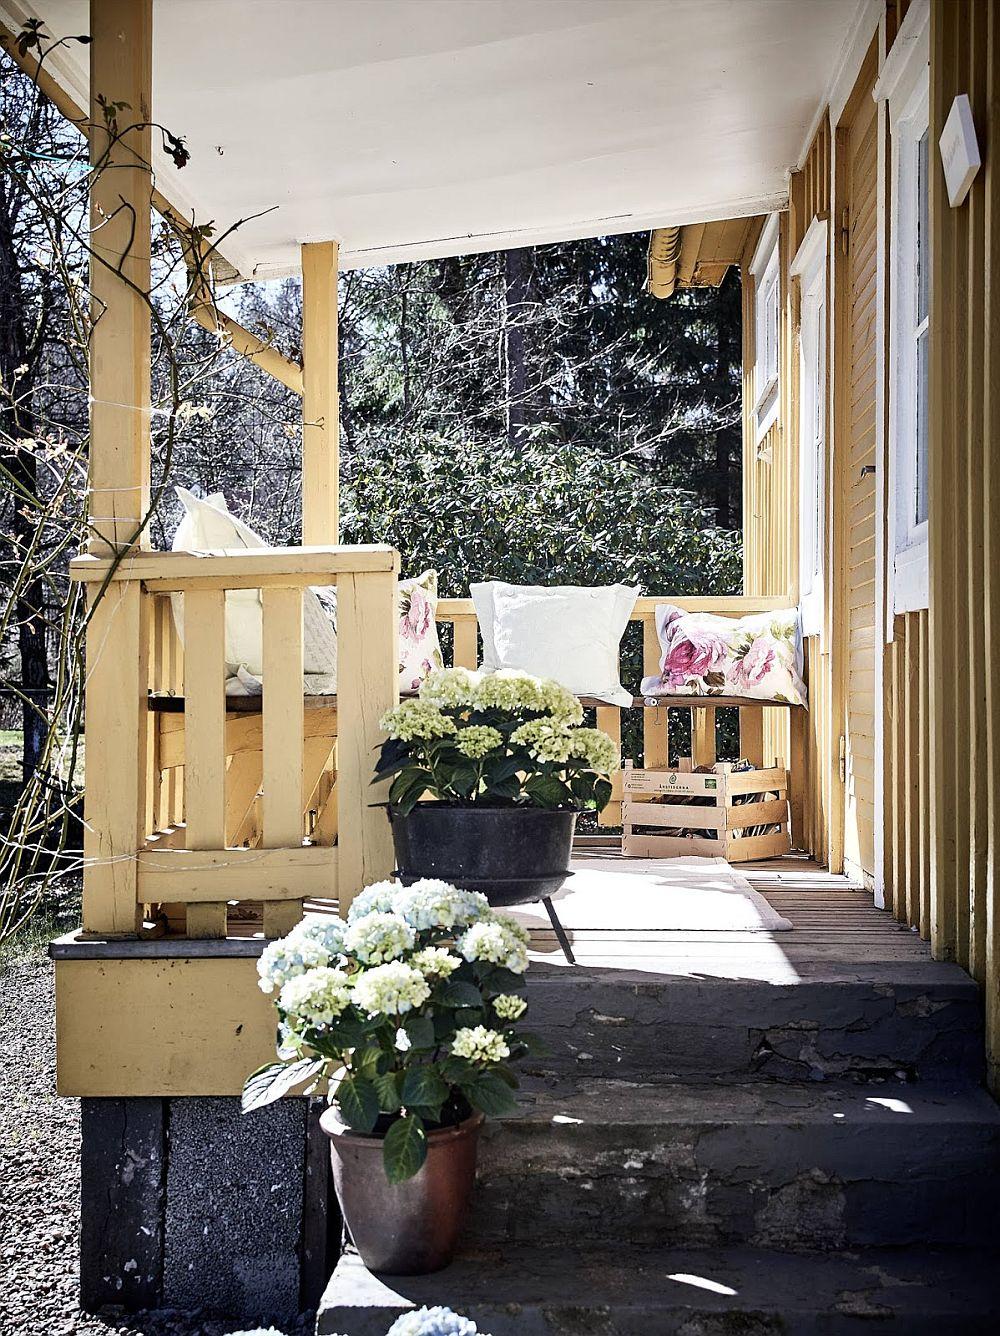 adelaparvu.com despre casa de vacanta 60 mp in Suedia, Foto Stadshem (17)